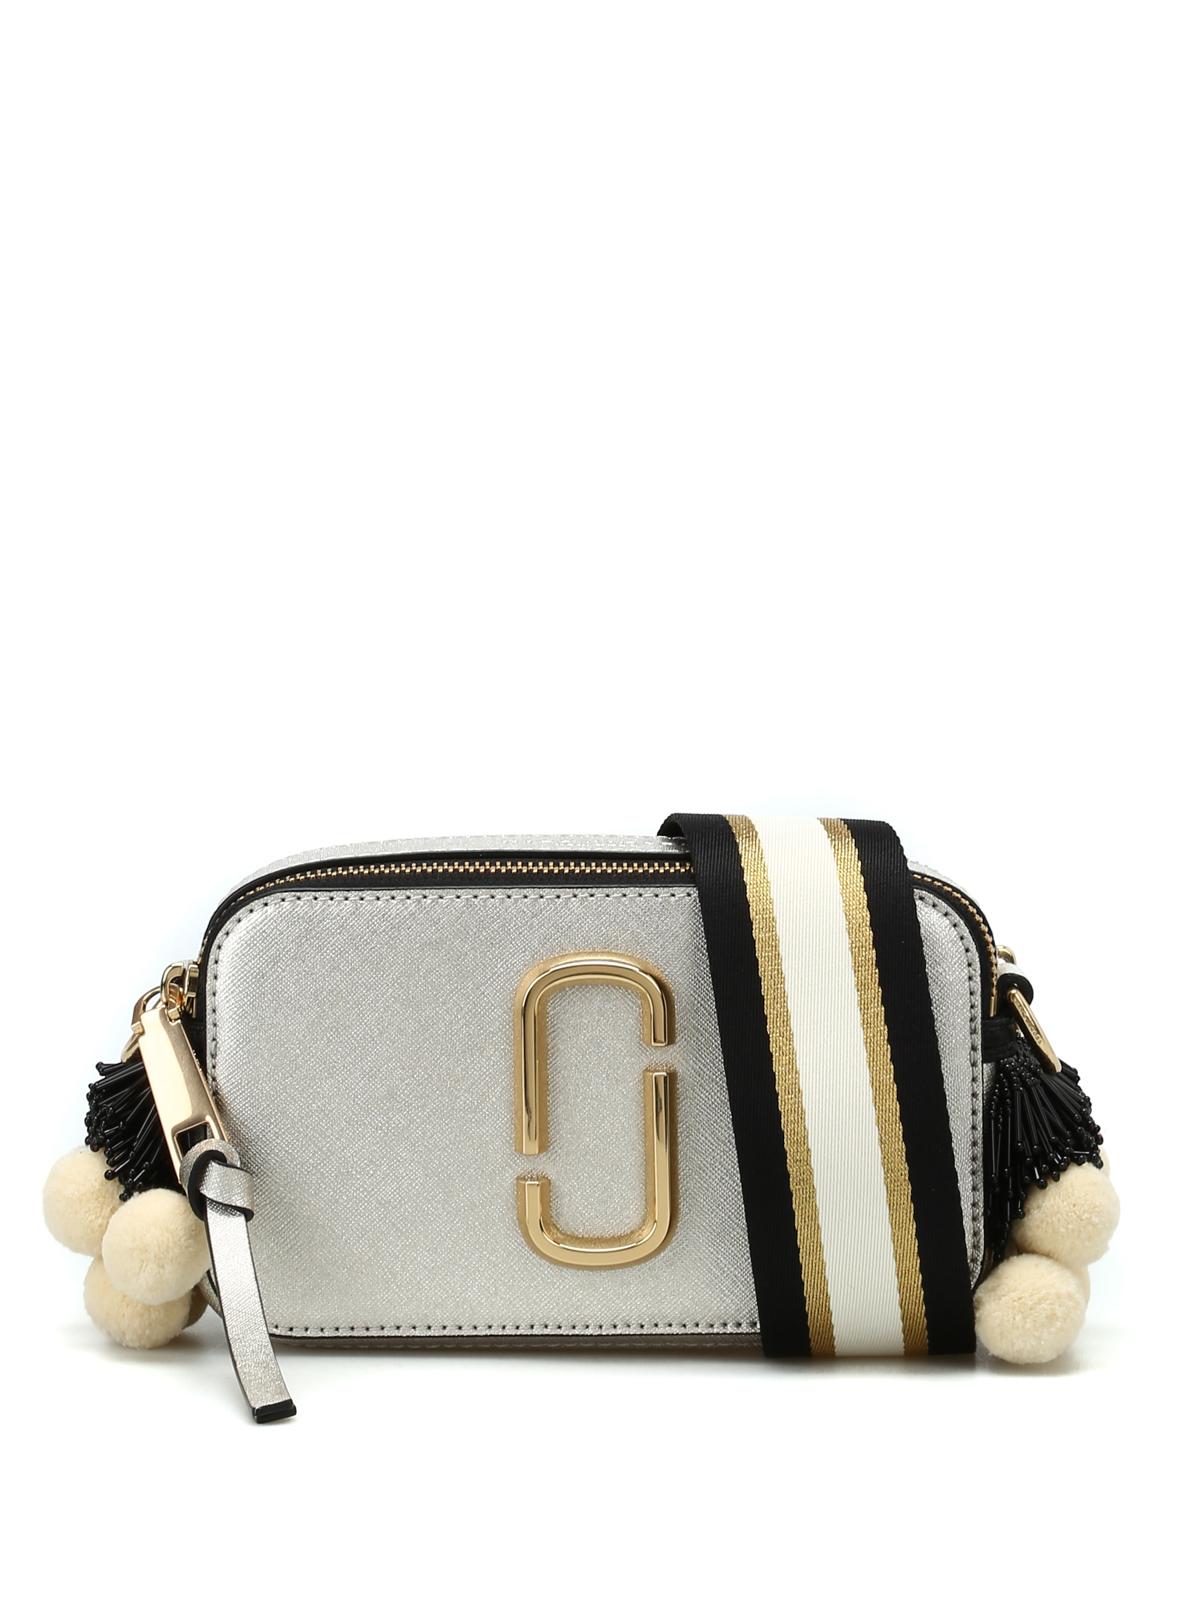 Marc Jacobs Snapshot S Embellished Bag Cross Body Bags